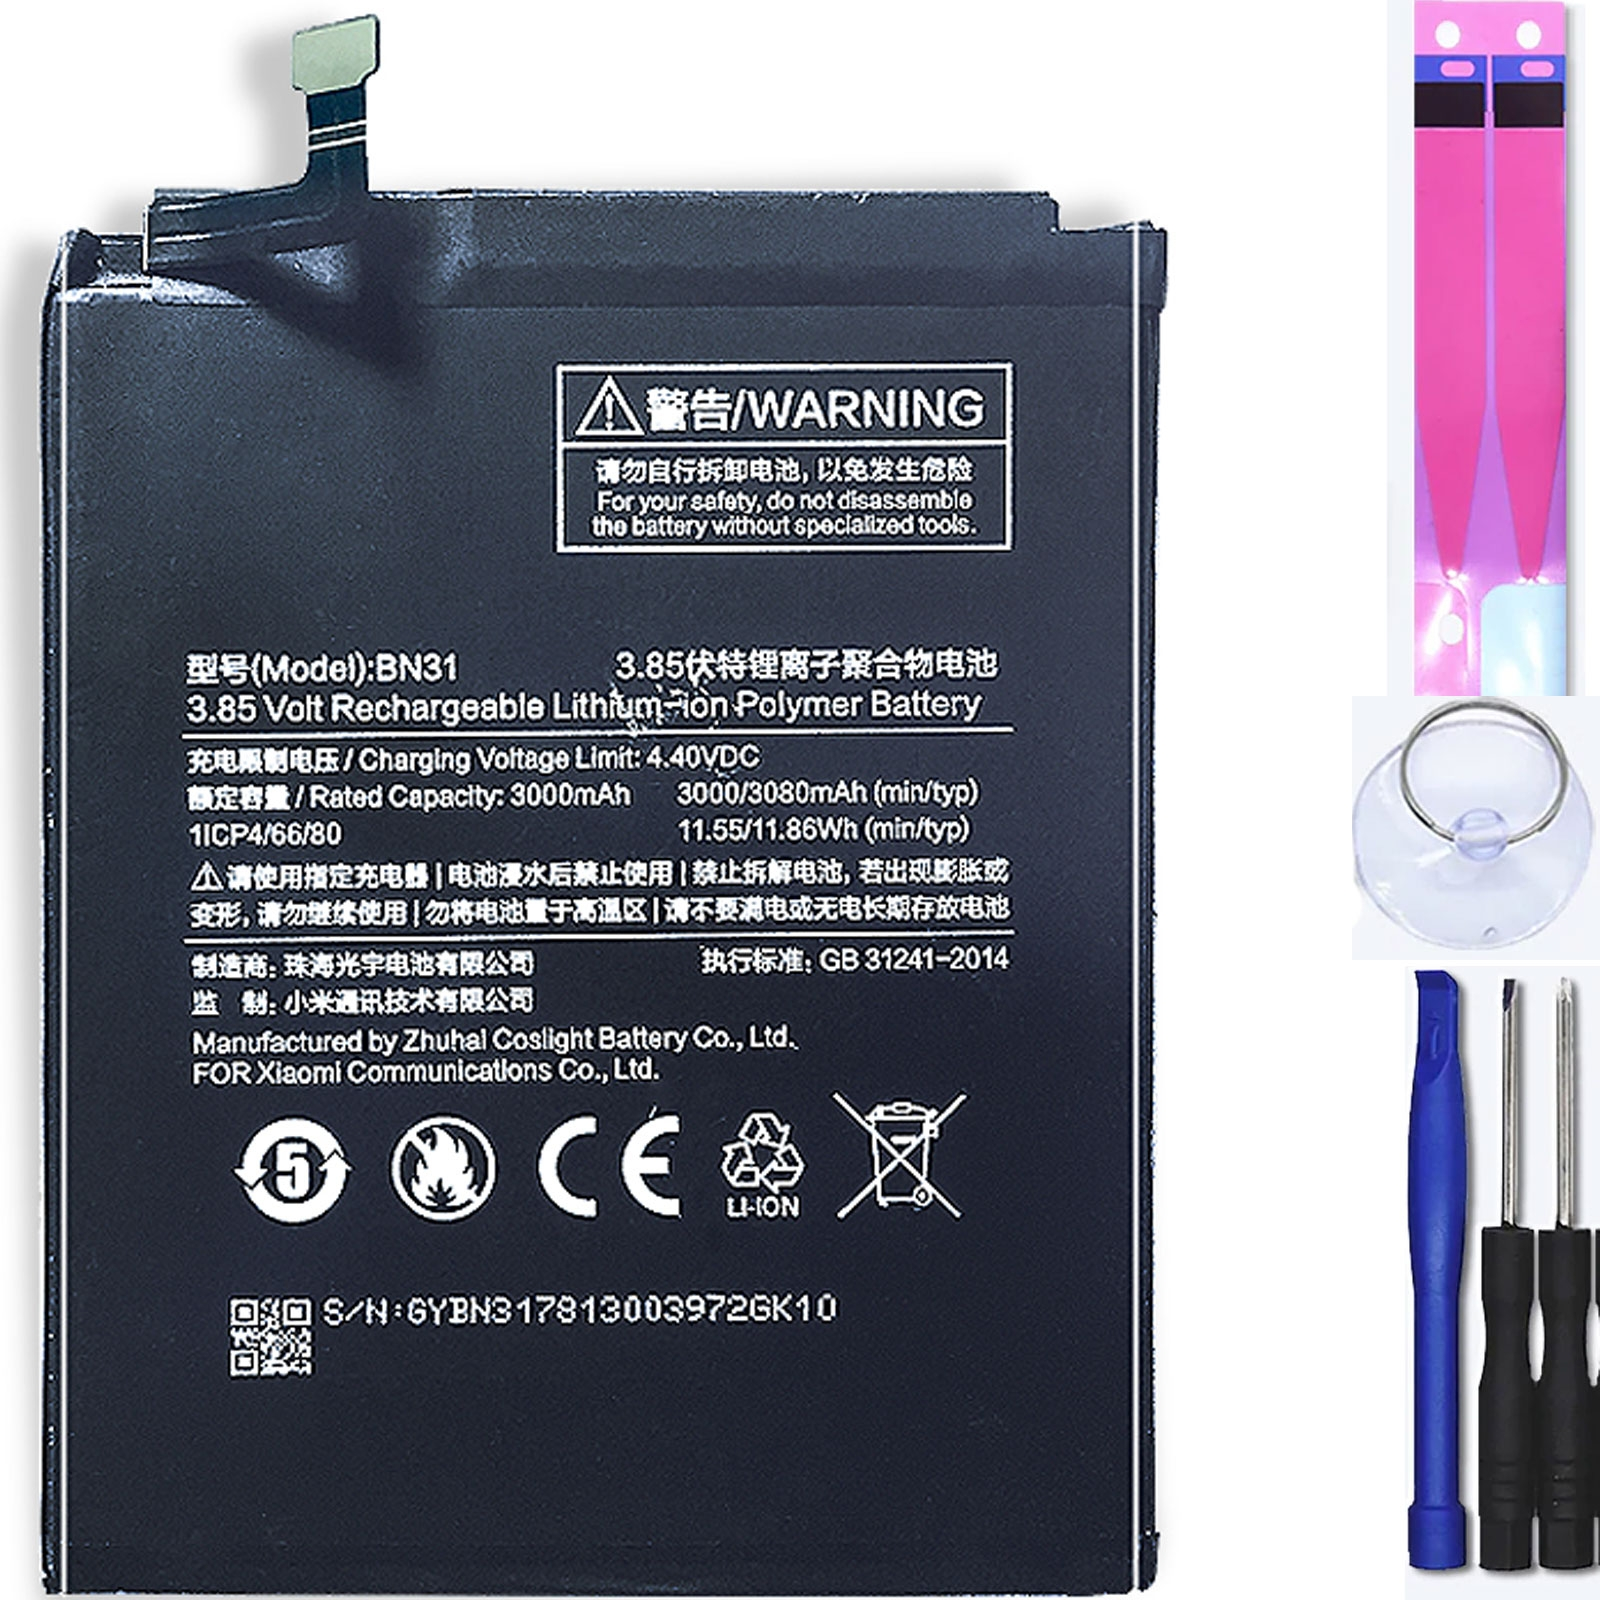 Аккумулятор для Xiaomi Mi A1 Redmi S2 Note 5A 5X 5A Pro S2 Y1 , MPN Оригинал BN31